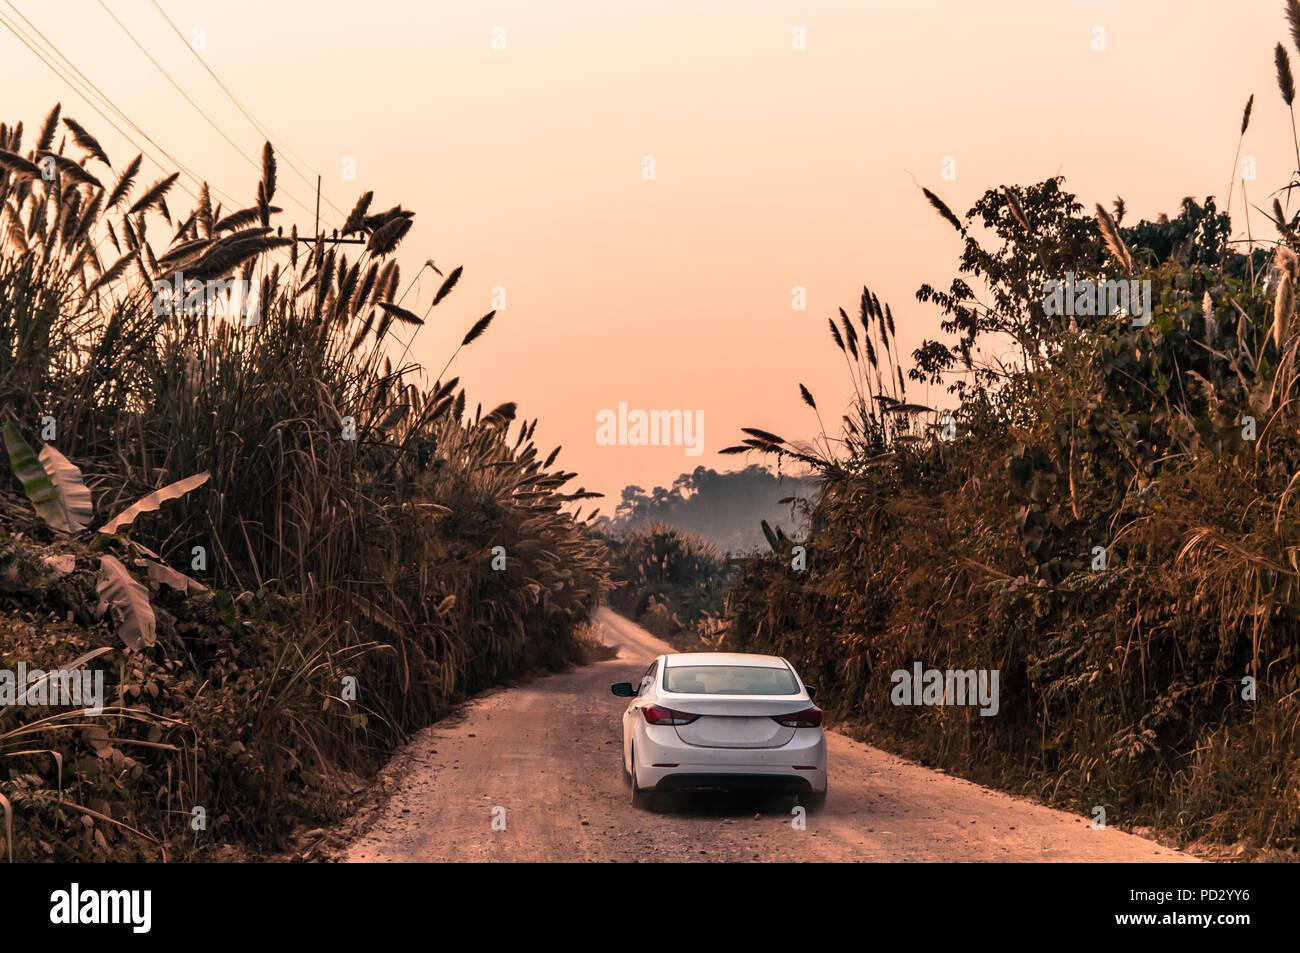 Road trip between Vietnam and Laos - Stock Image